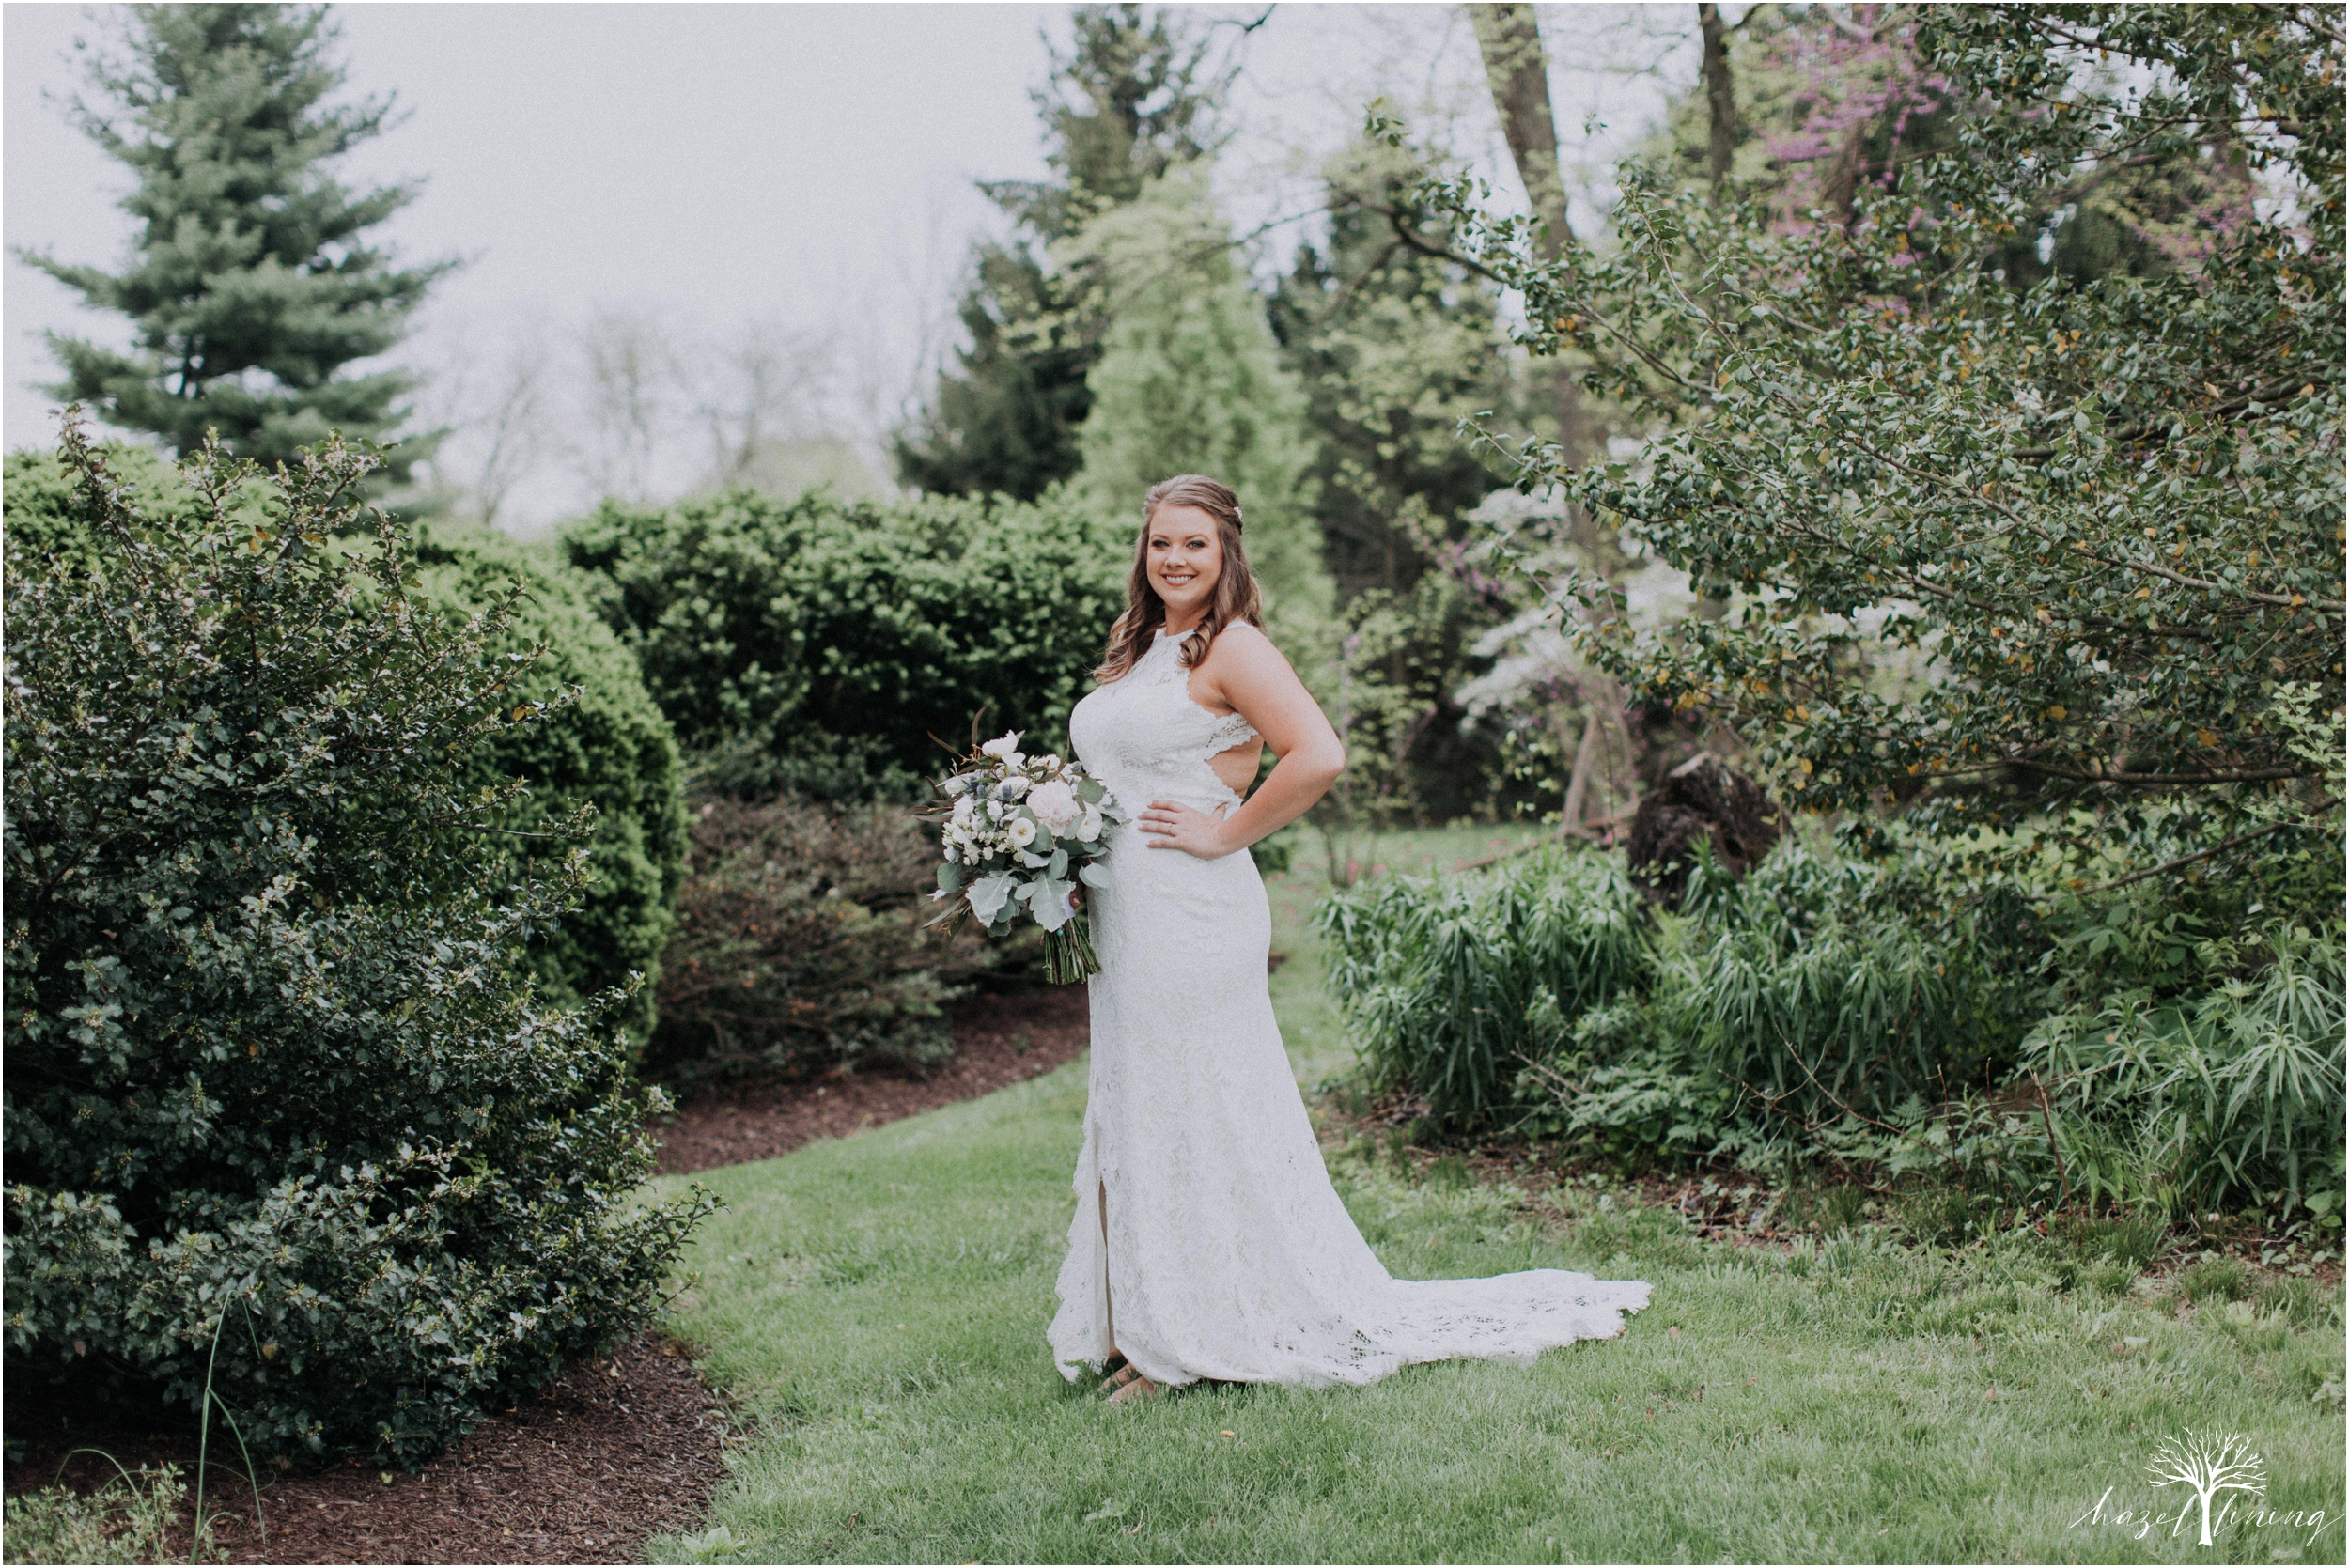 hazel-lining-travel-wedding-elopement-photography-abby-skyler-hunt-the-willis-house-york-pennsylvania-outdoor-estate-wedding_0012.jpg